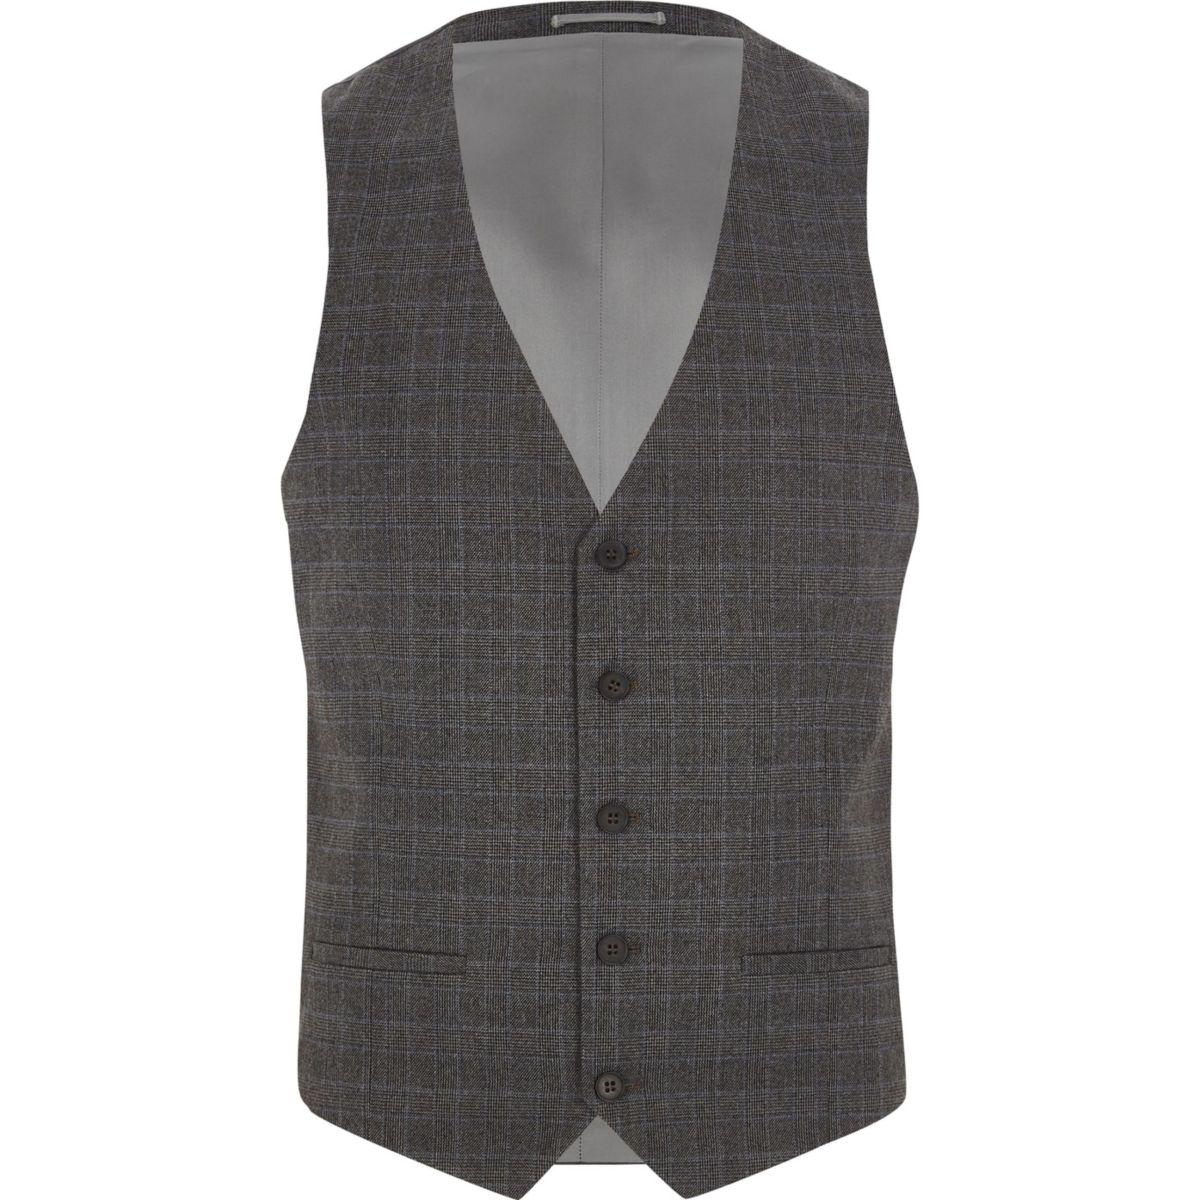 Grey Prince of Wales suit vest